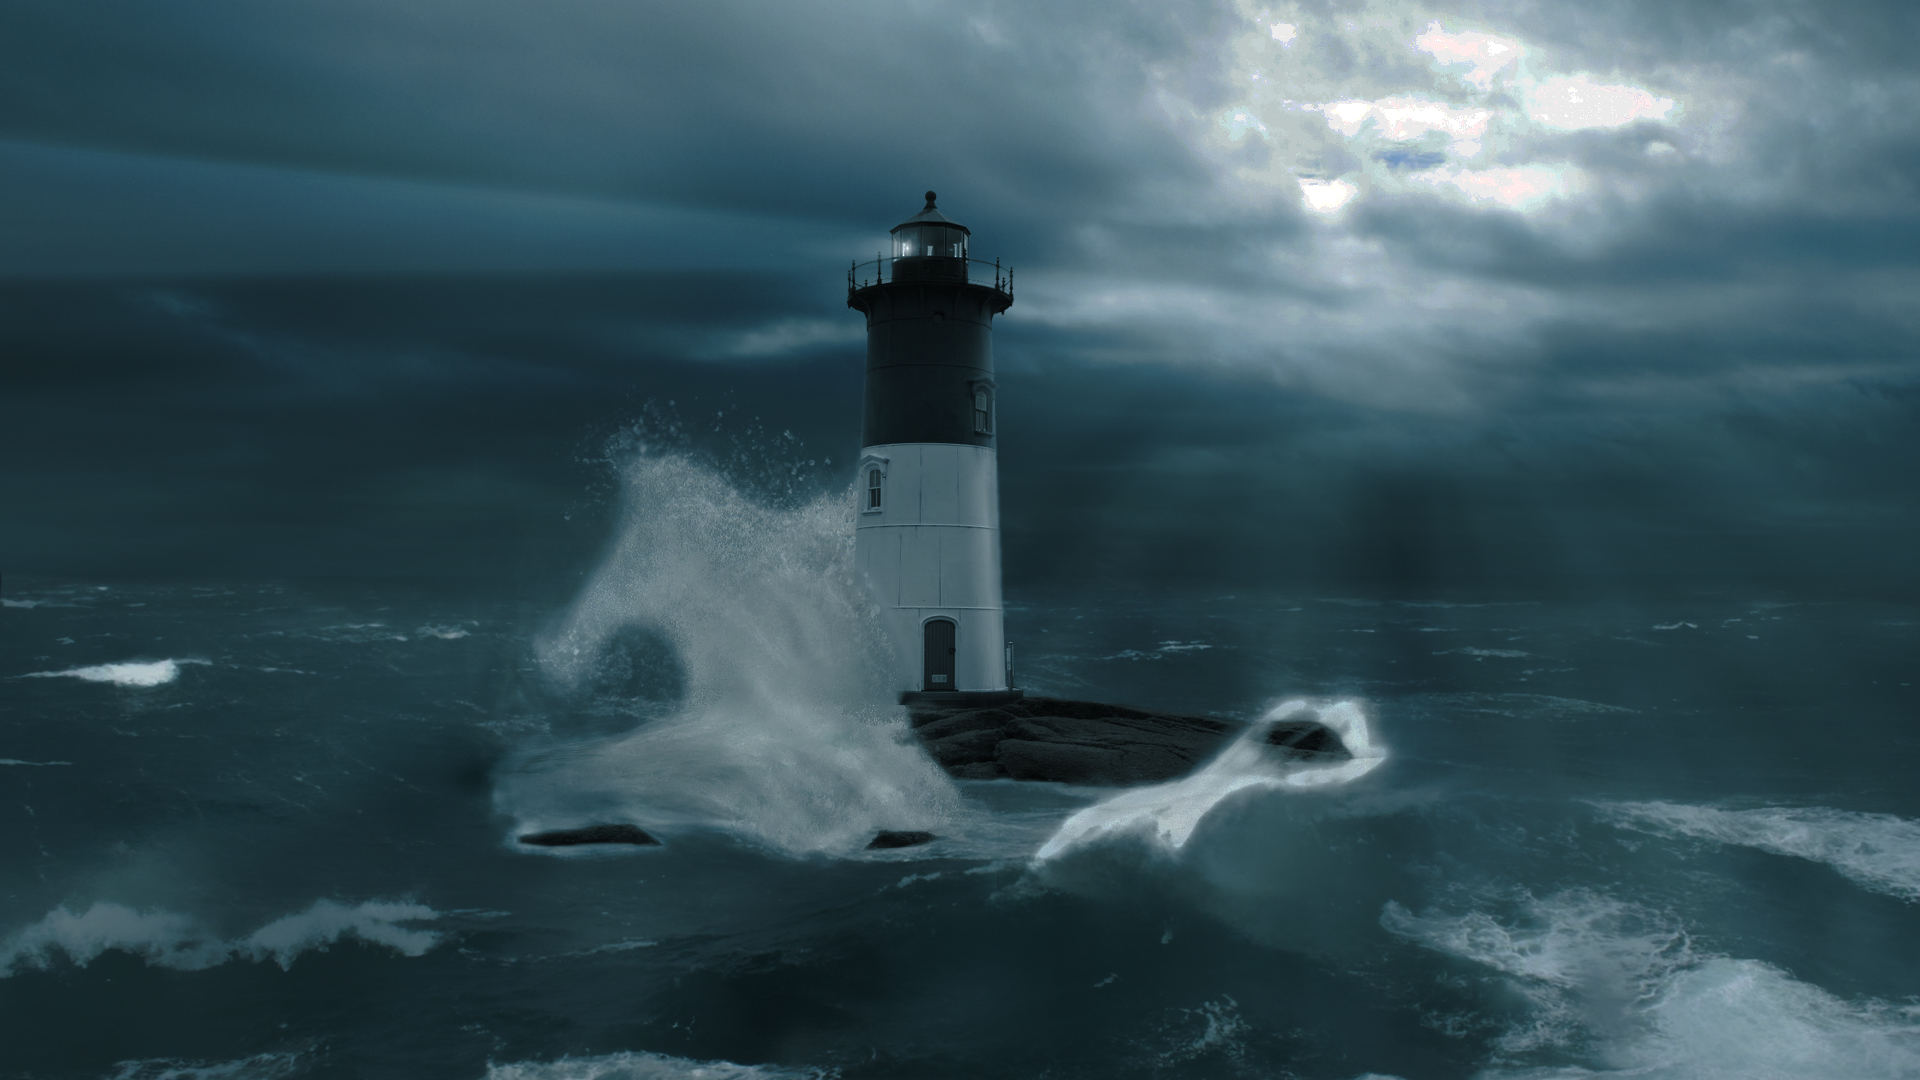 Lighthouse Storm by GunGodTheGreat on DeviantArt